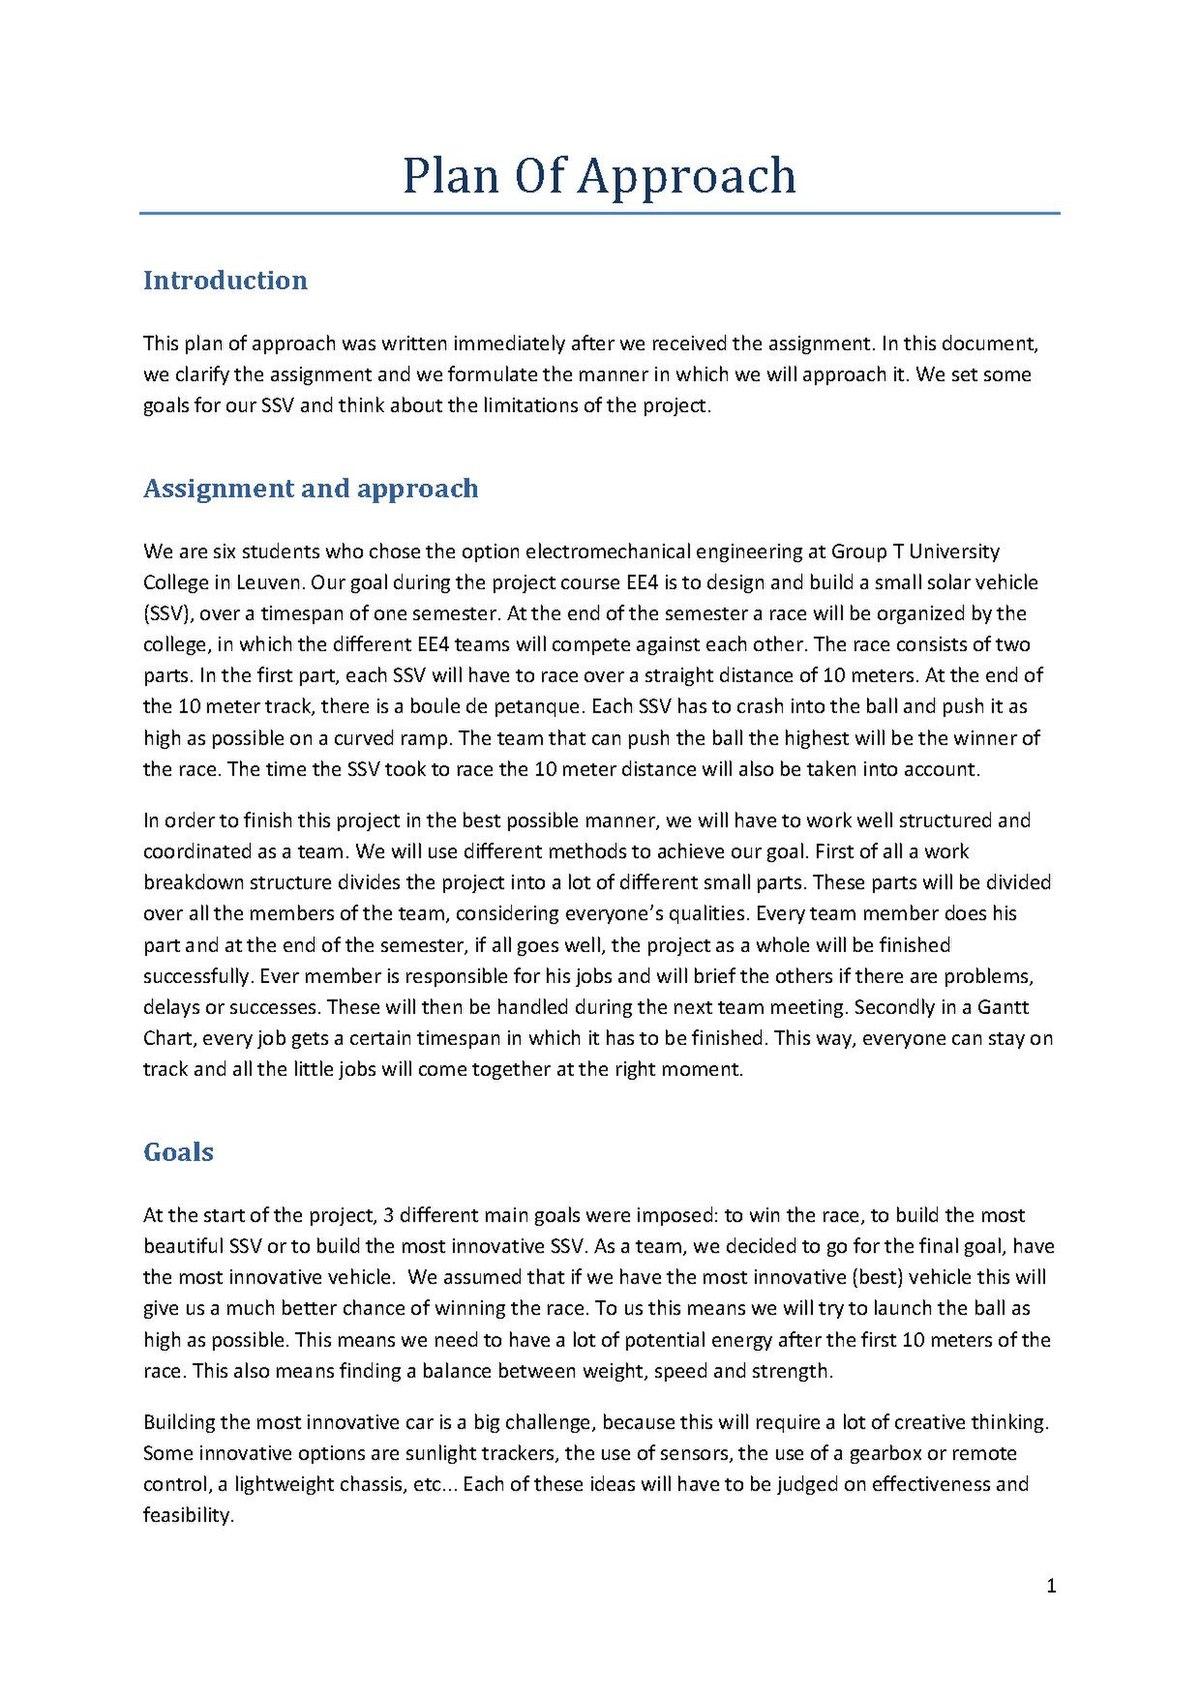 File:Plan van aanpak (Engels) pdf - Wikiversity